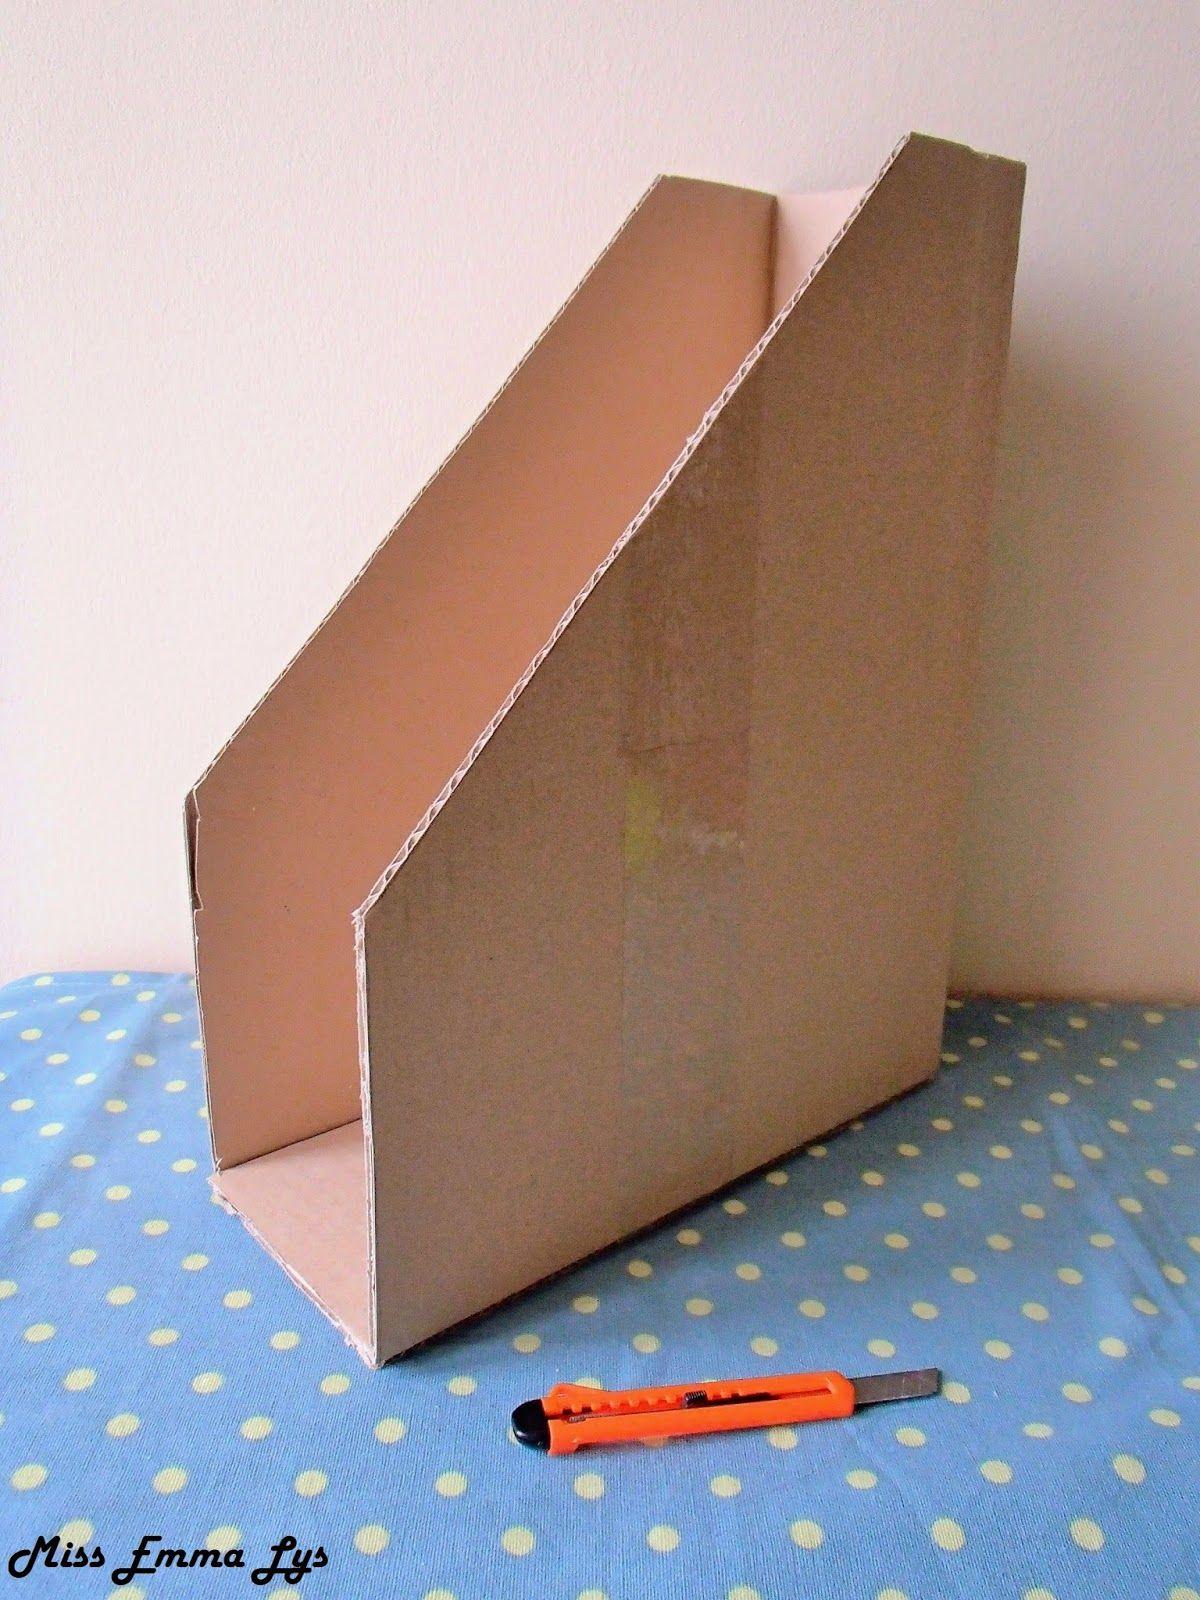 Diy Range Documents Boite De Rangement Carton Scrapbooking Rangement